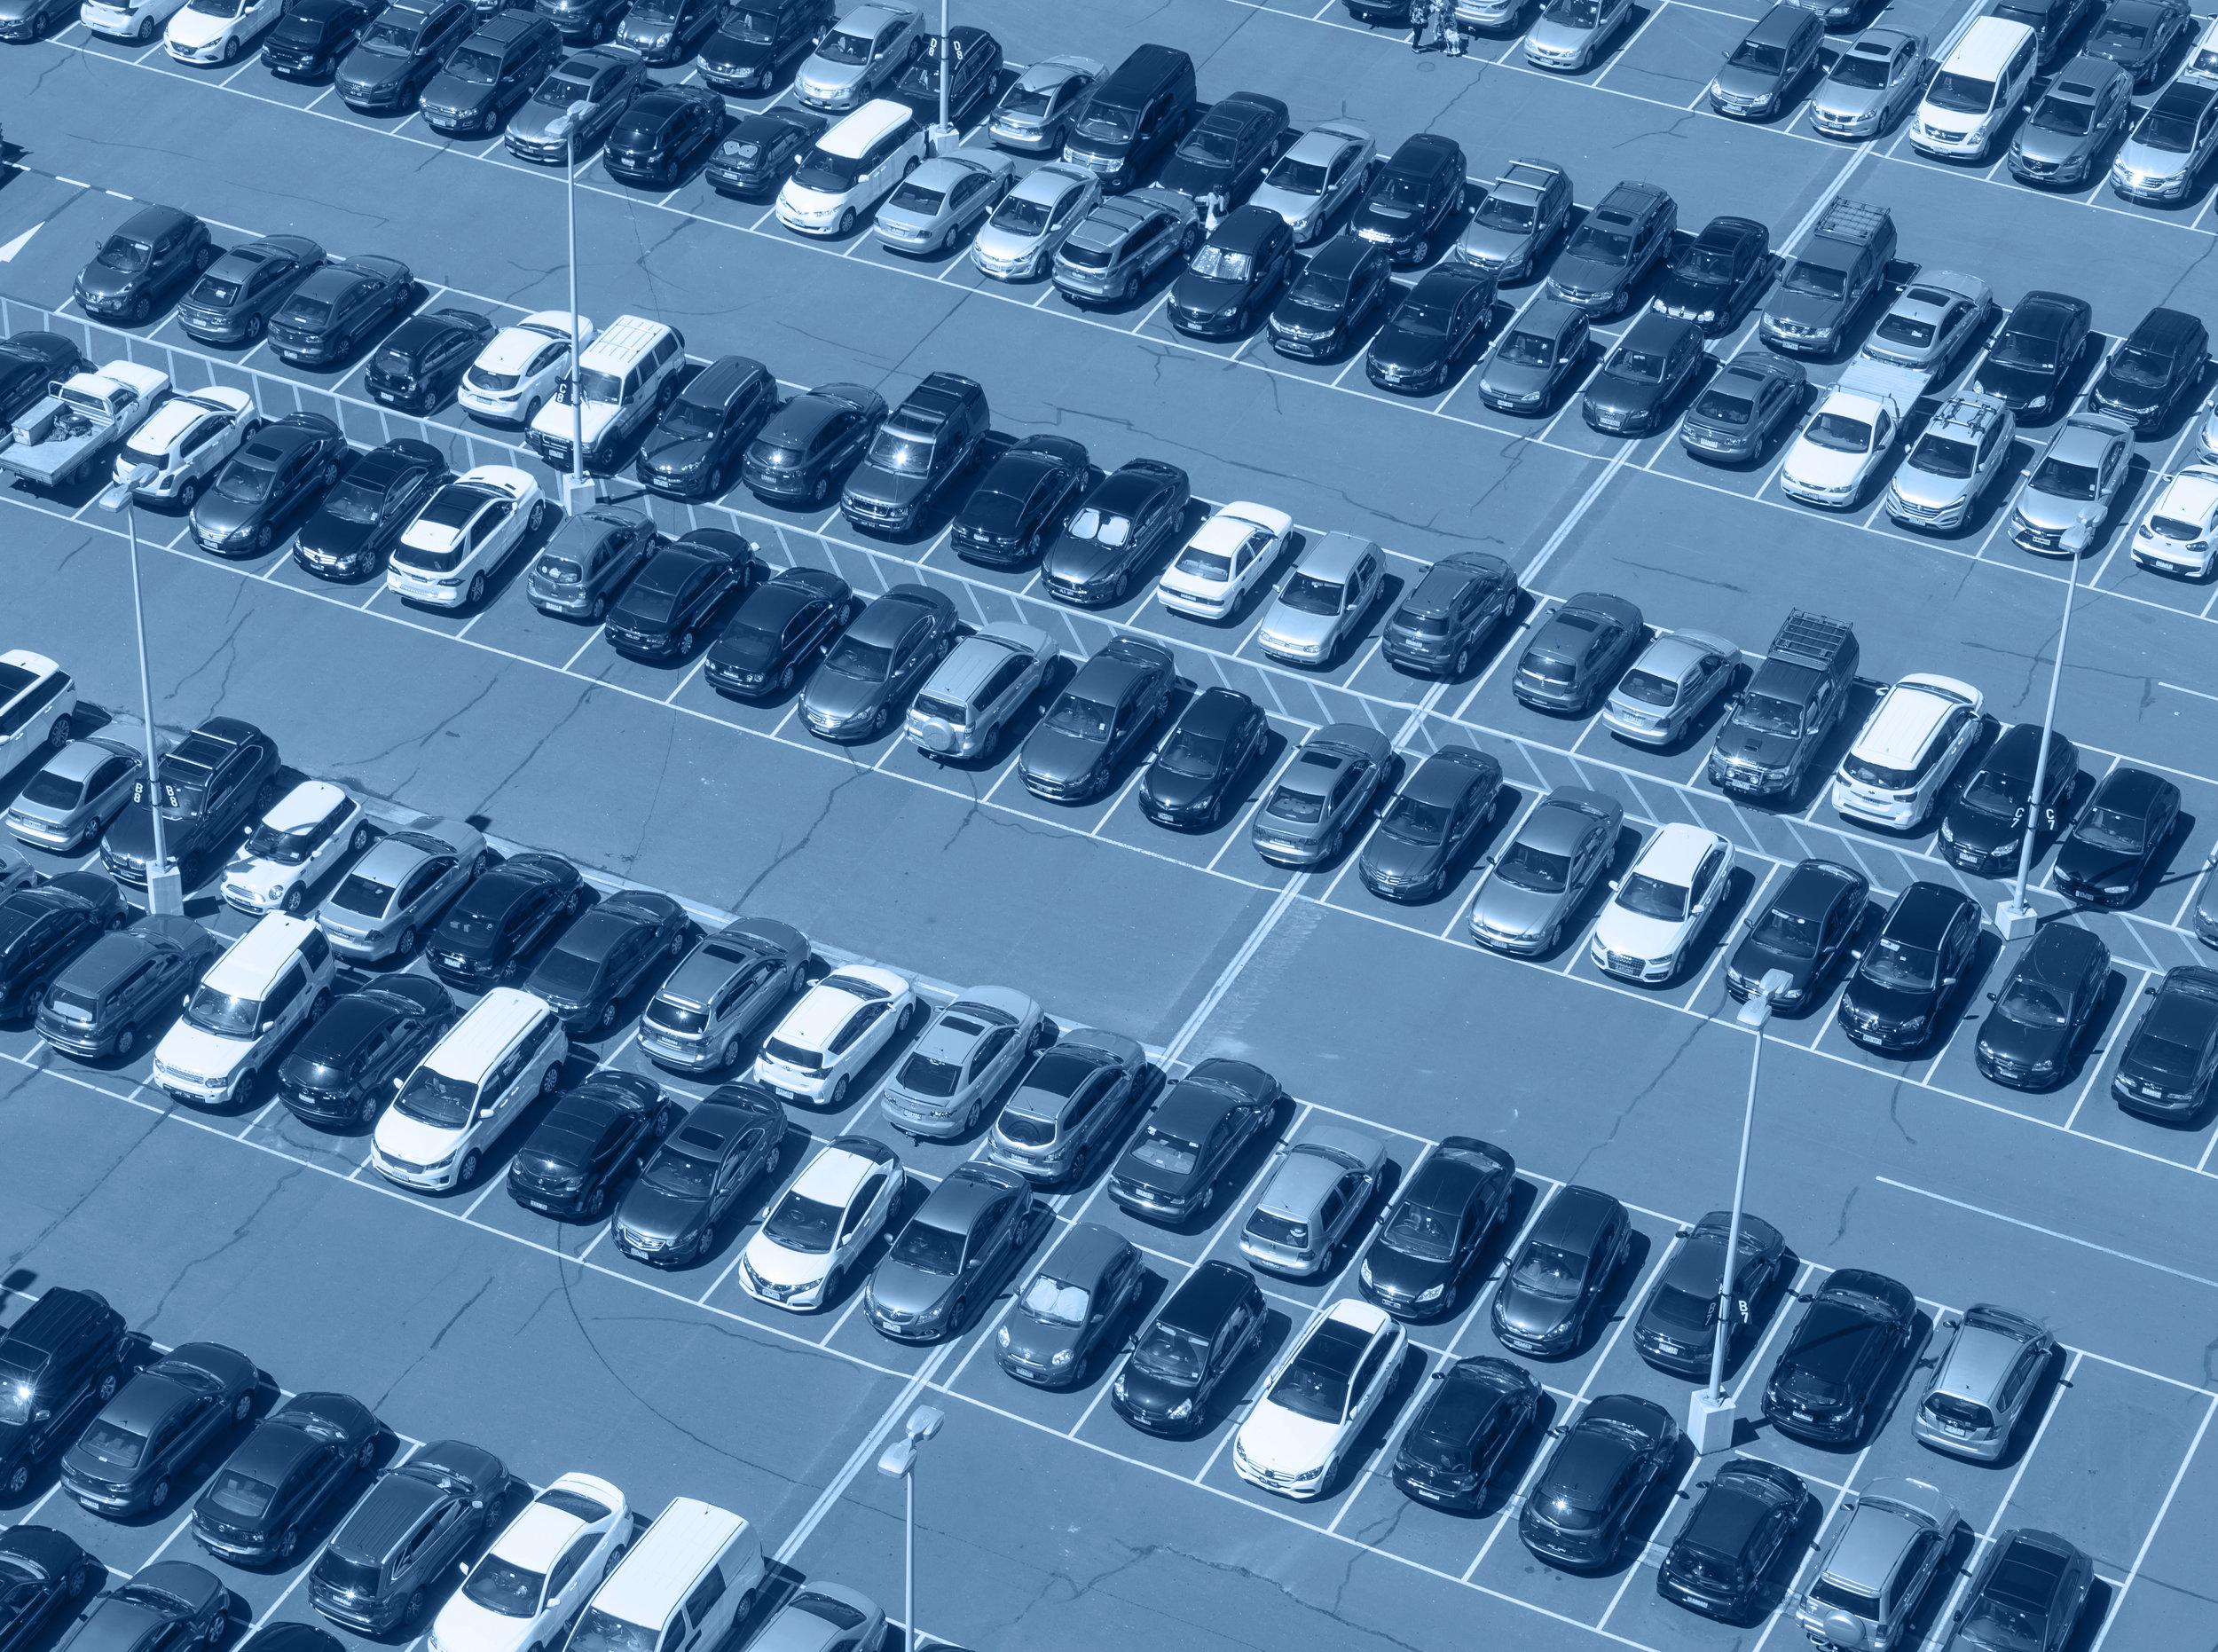 Parking Lot Stock Photo BLUE.jpg